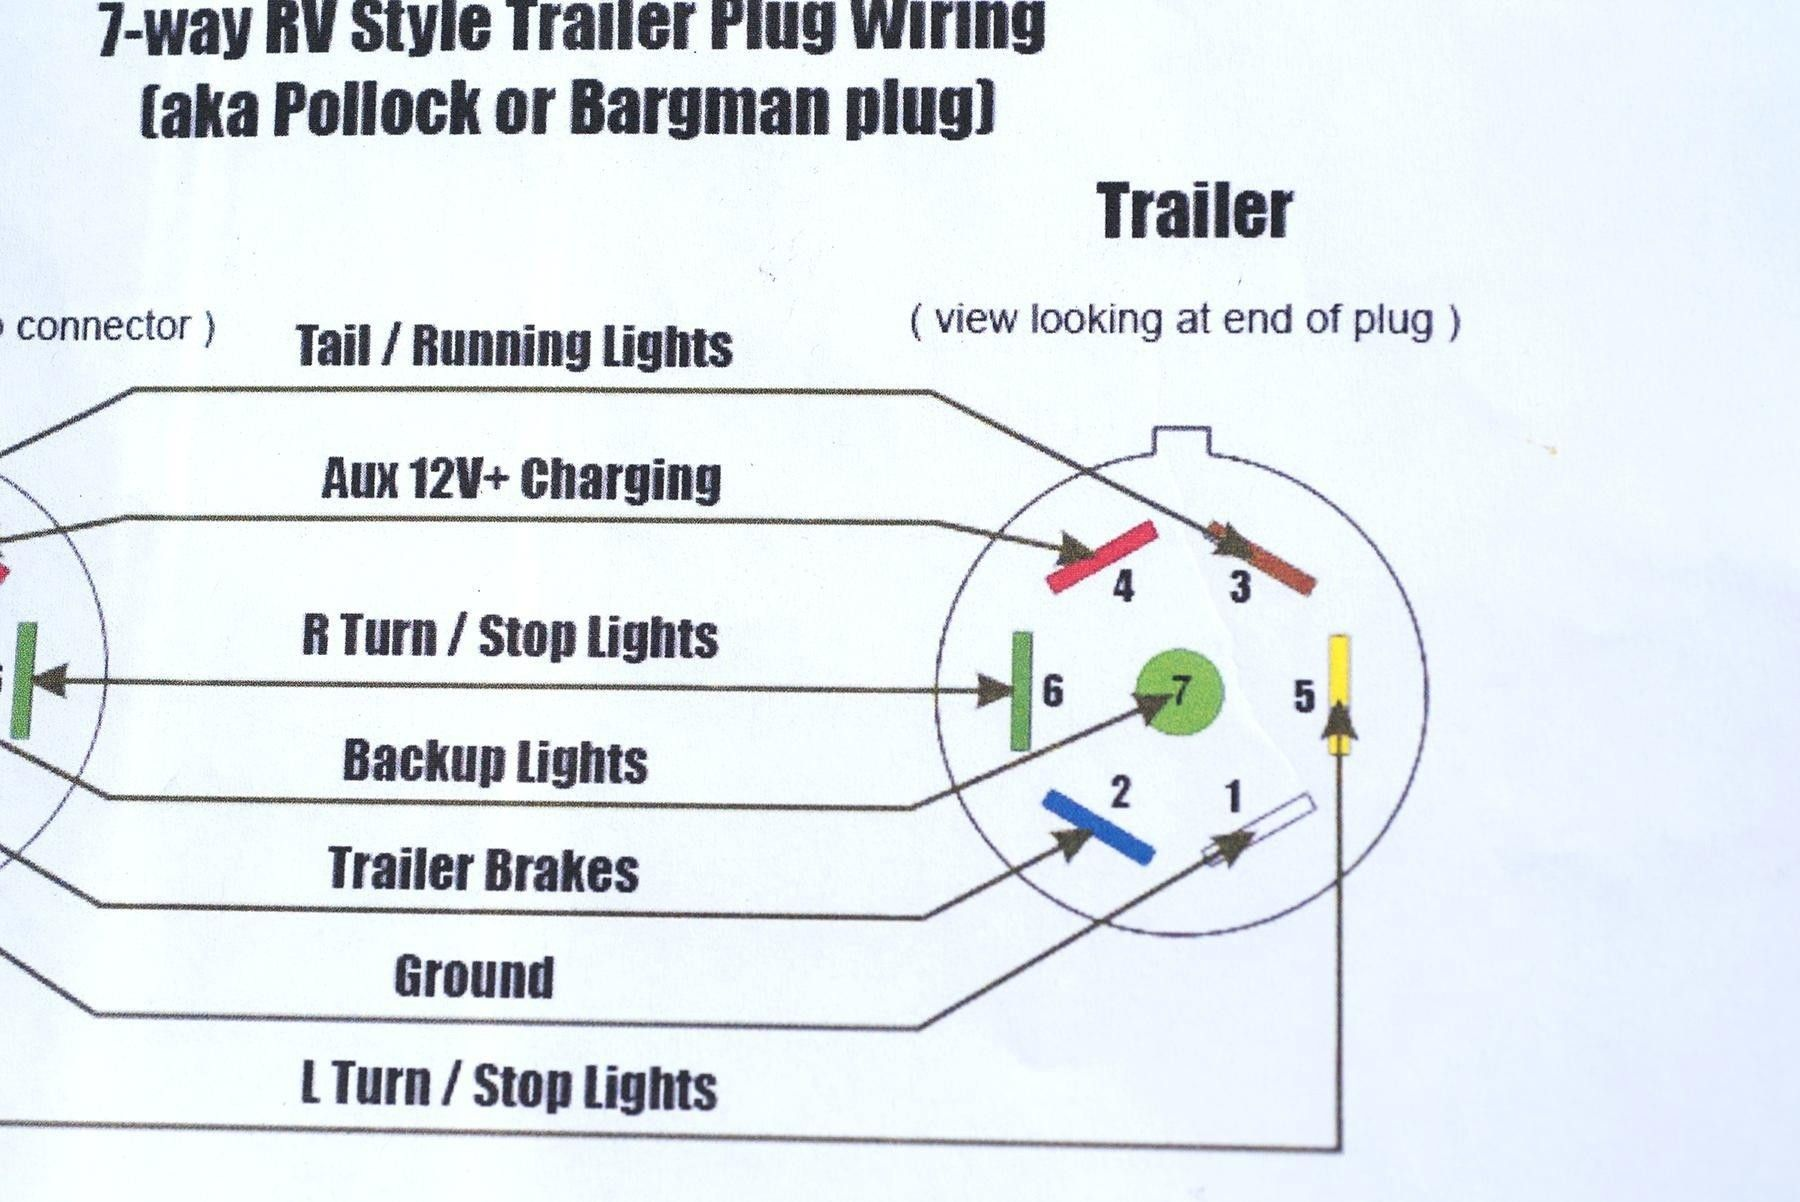 Awesome Wiring Diagram Downlights Diagrams Digramssample Diagramimages Wiringdiagramsample Trailer Wiring Diagram Trailer Light Wiring Boat Trailer Lights